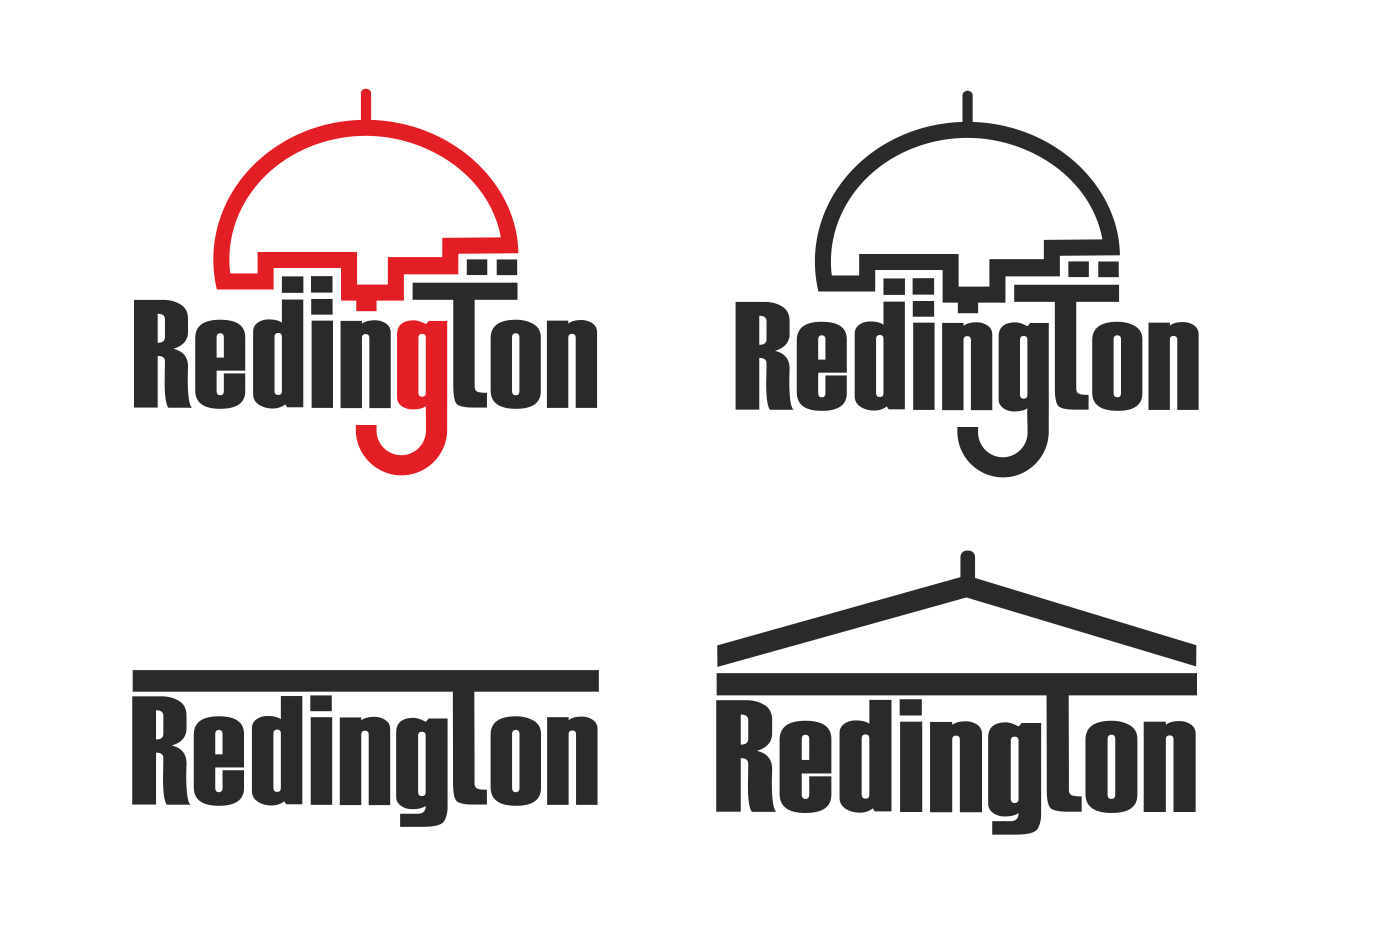 Создание логотипа для компании Redington фото f_10459b986c5ae96d.png